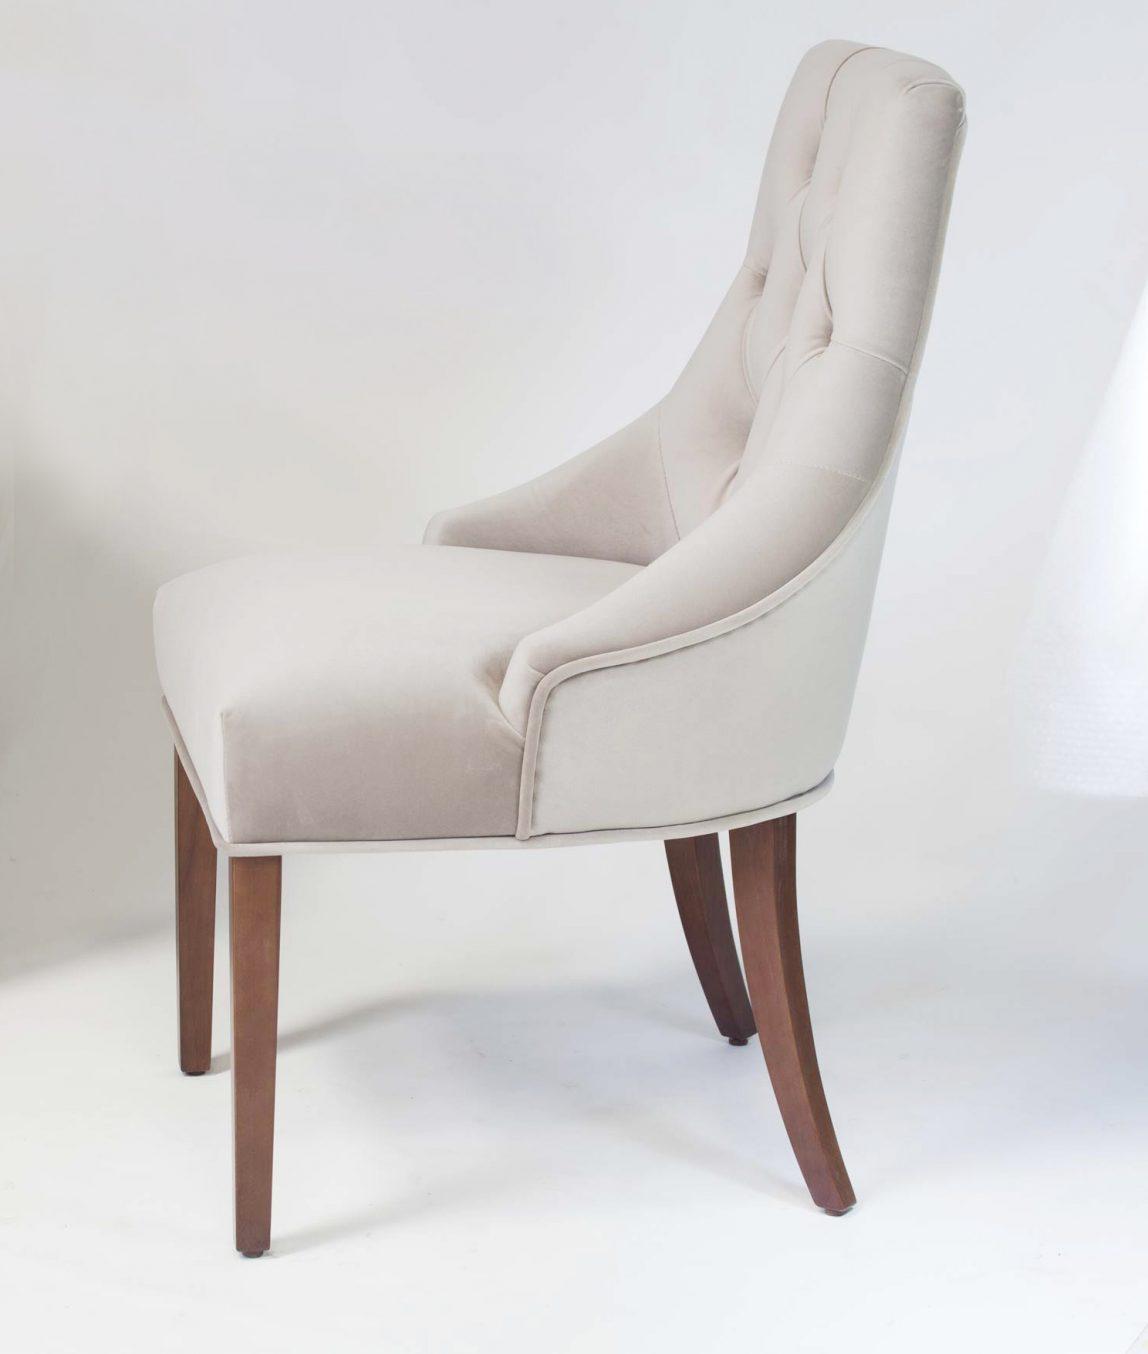 Мягкий стул Жорж в стиле нео классика с каретной стяжкой